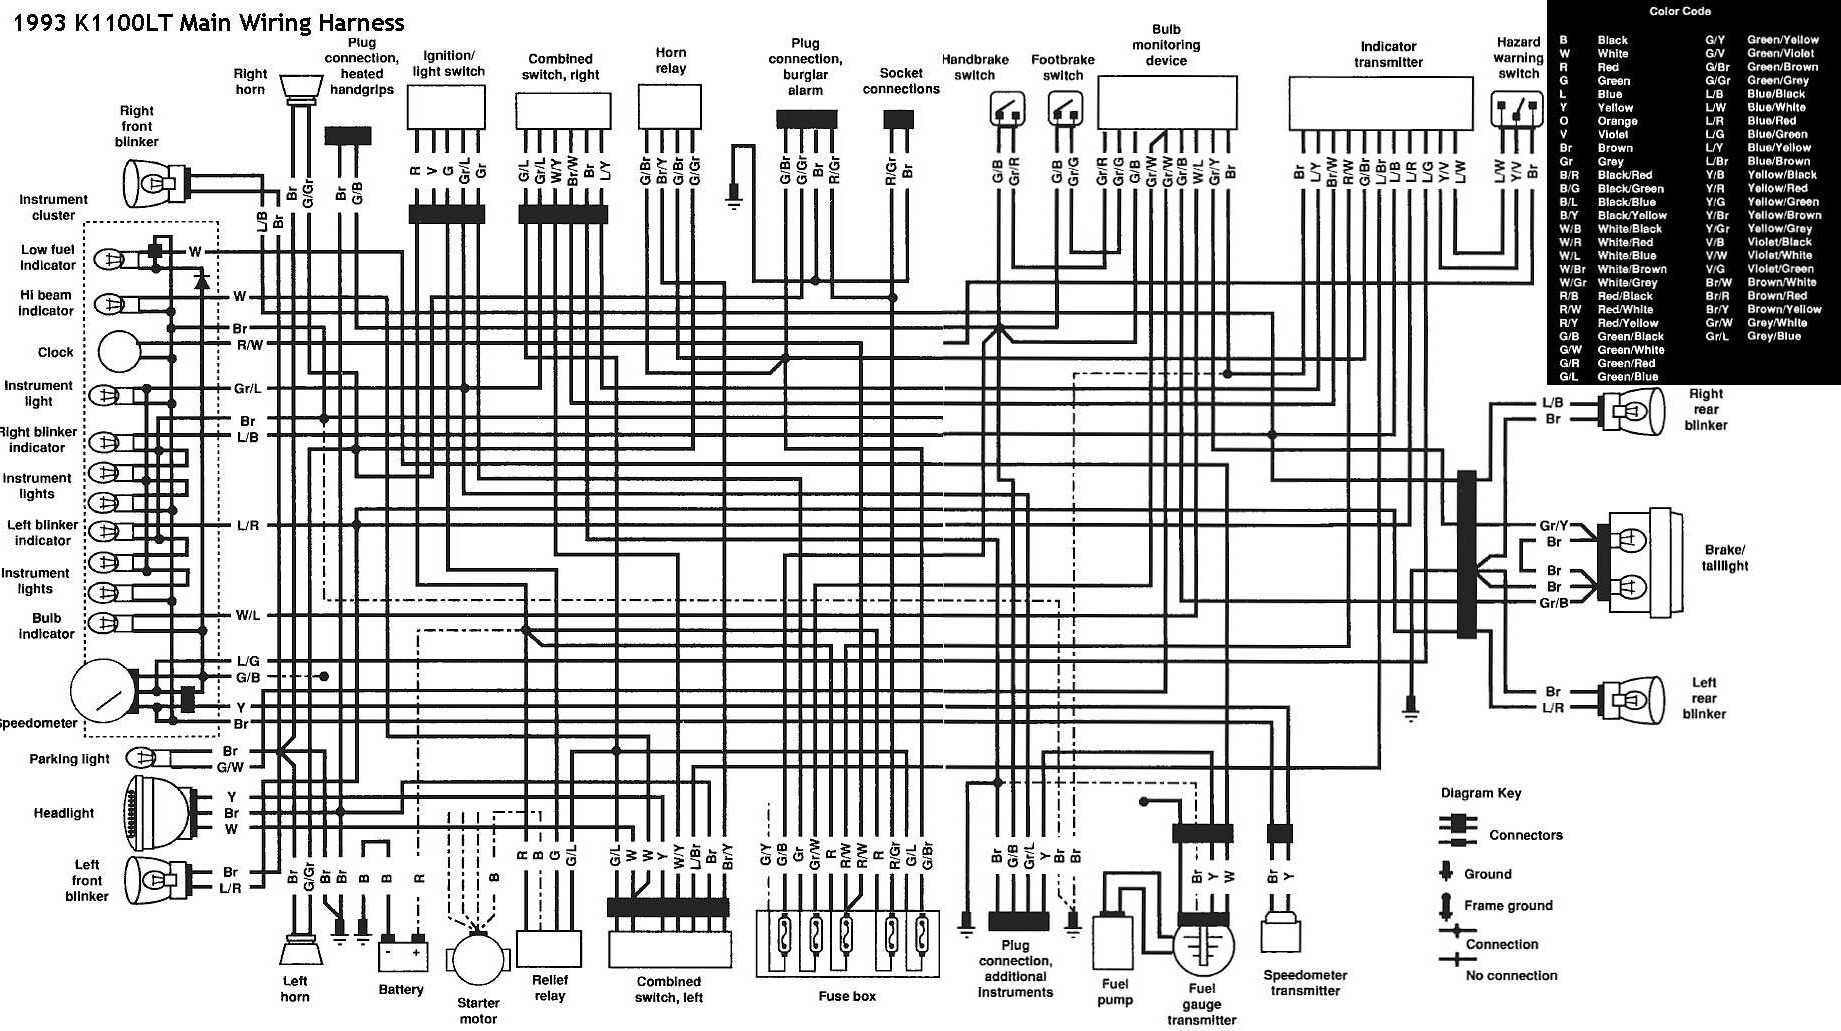 Schema electrique k75